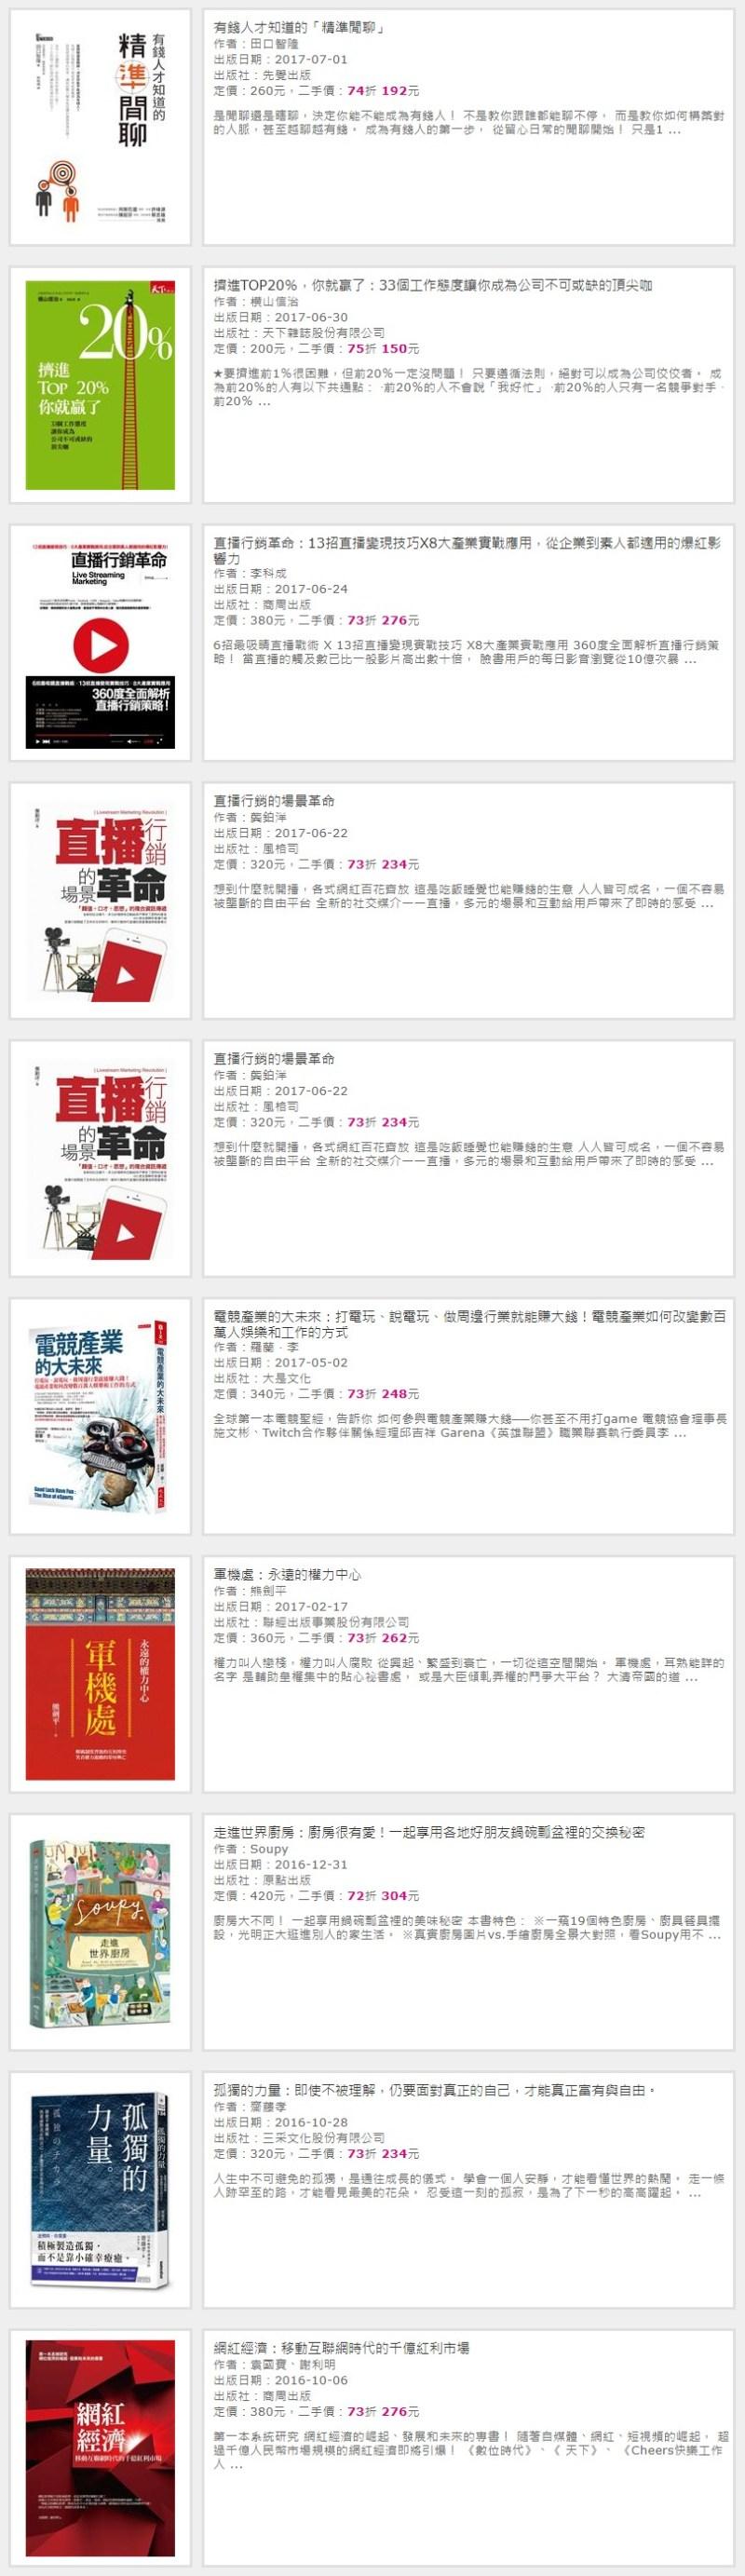 FireShot Capture 030 TAAZE 讀冊生活|二手書店|Wayne www.taaze .tw